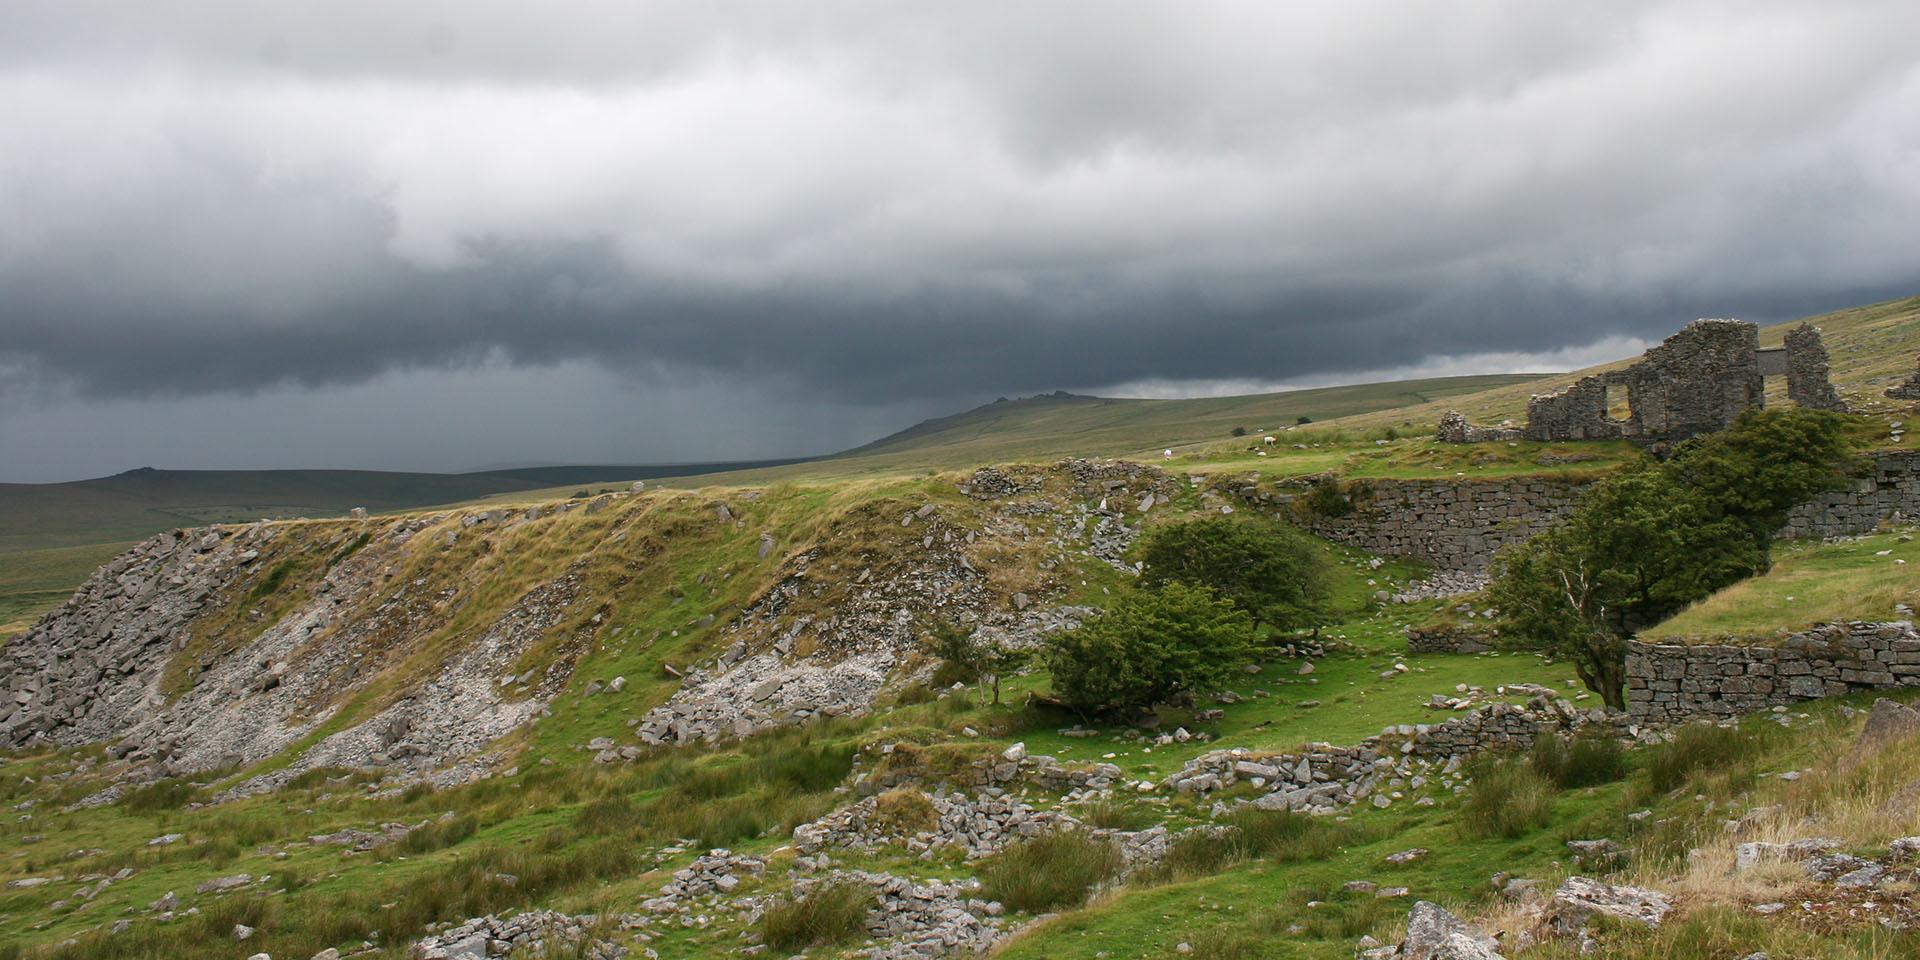 Foggintor Quarry in stormy backdrop